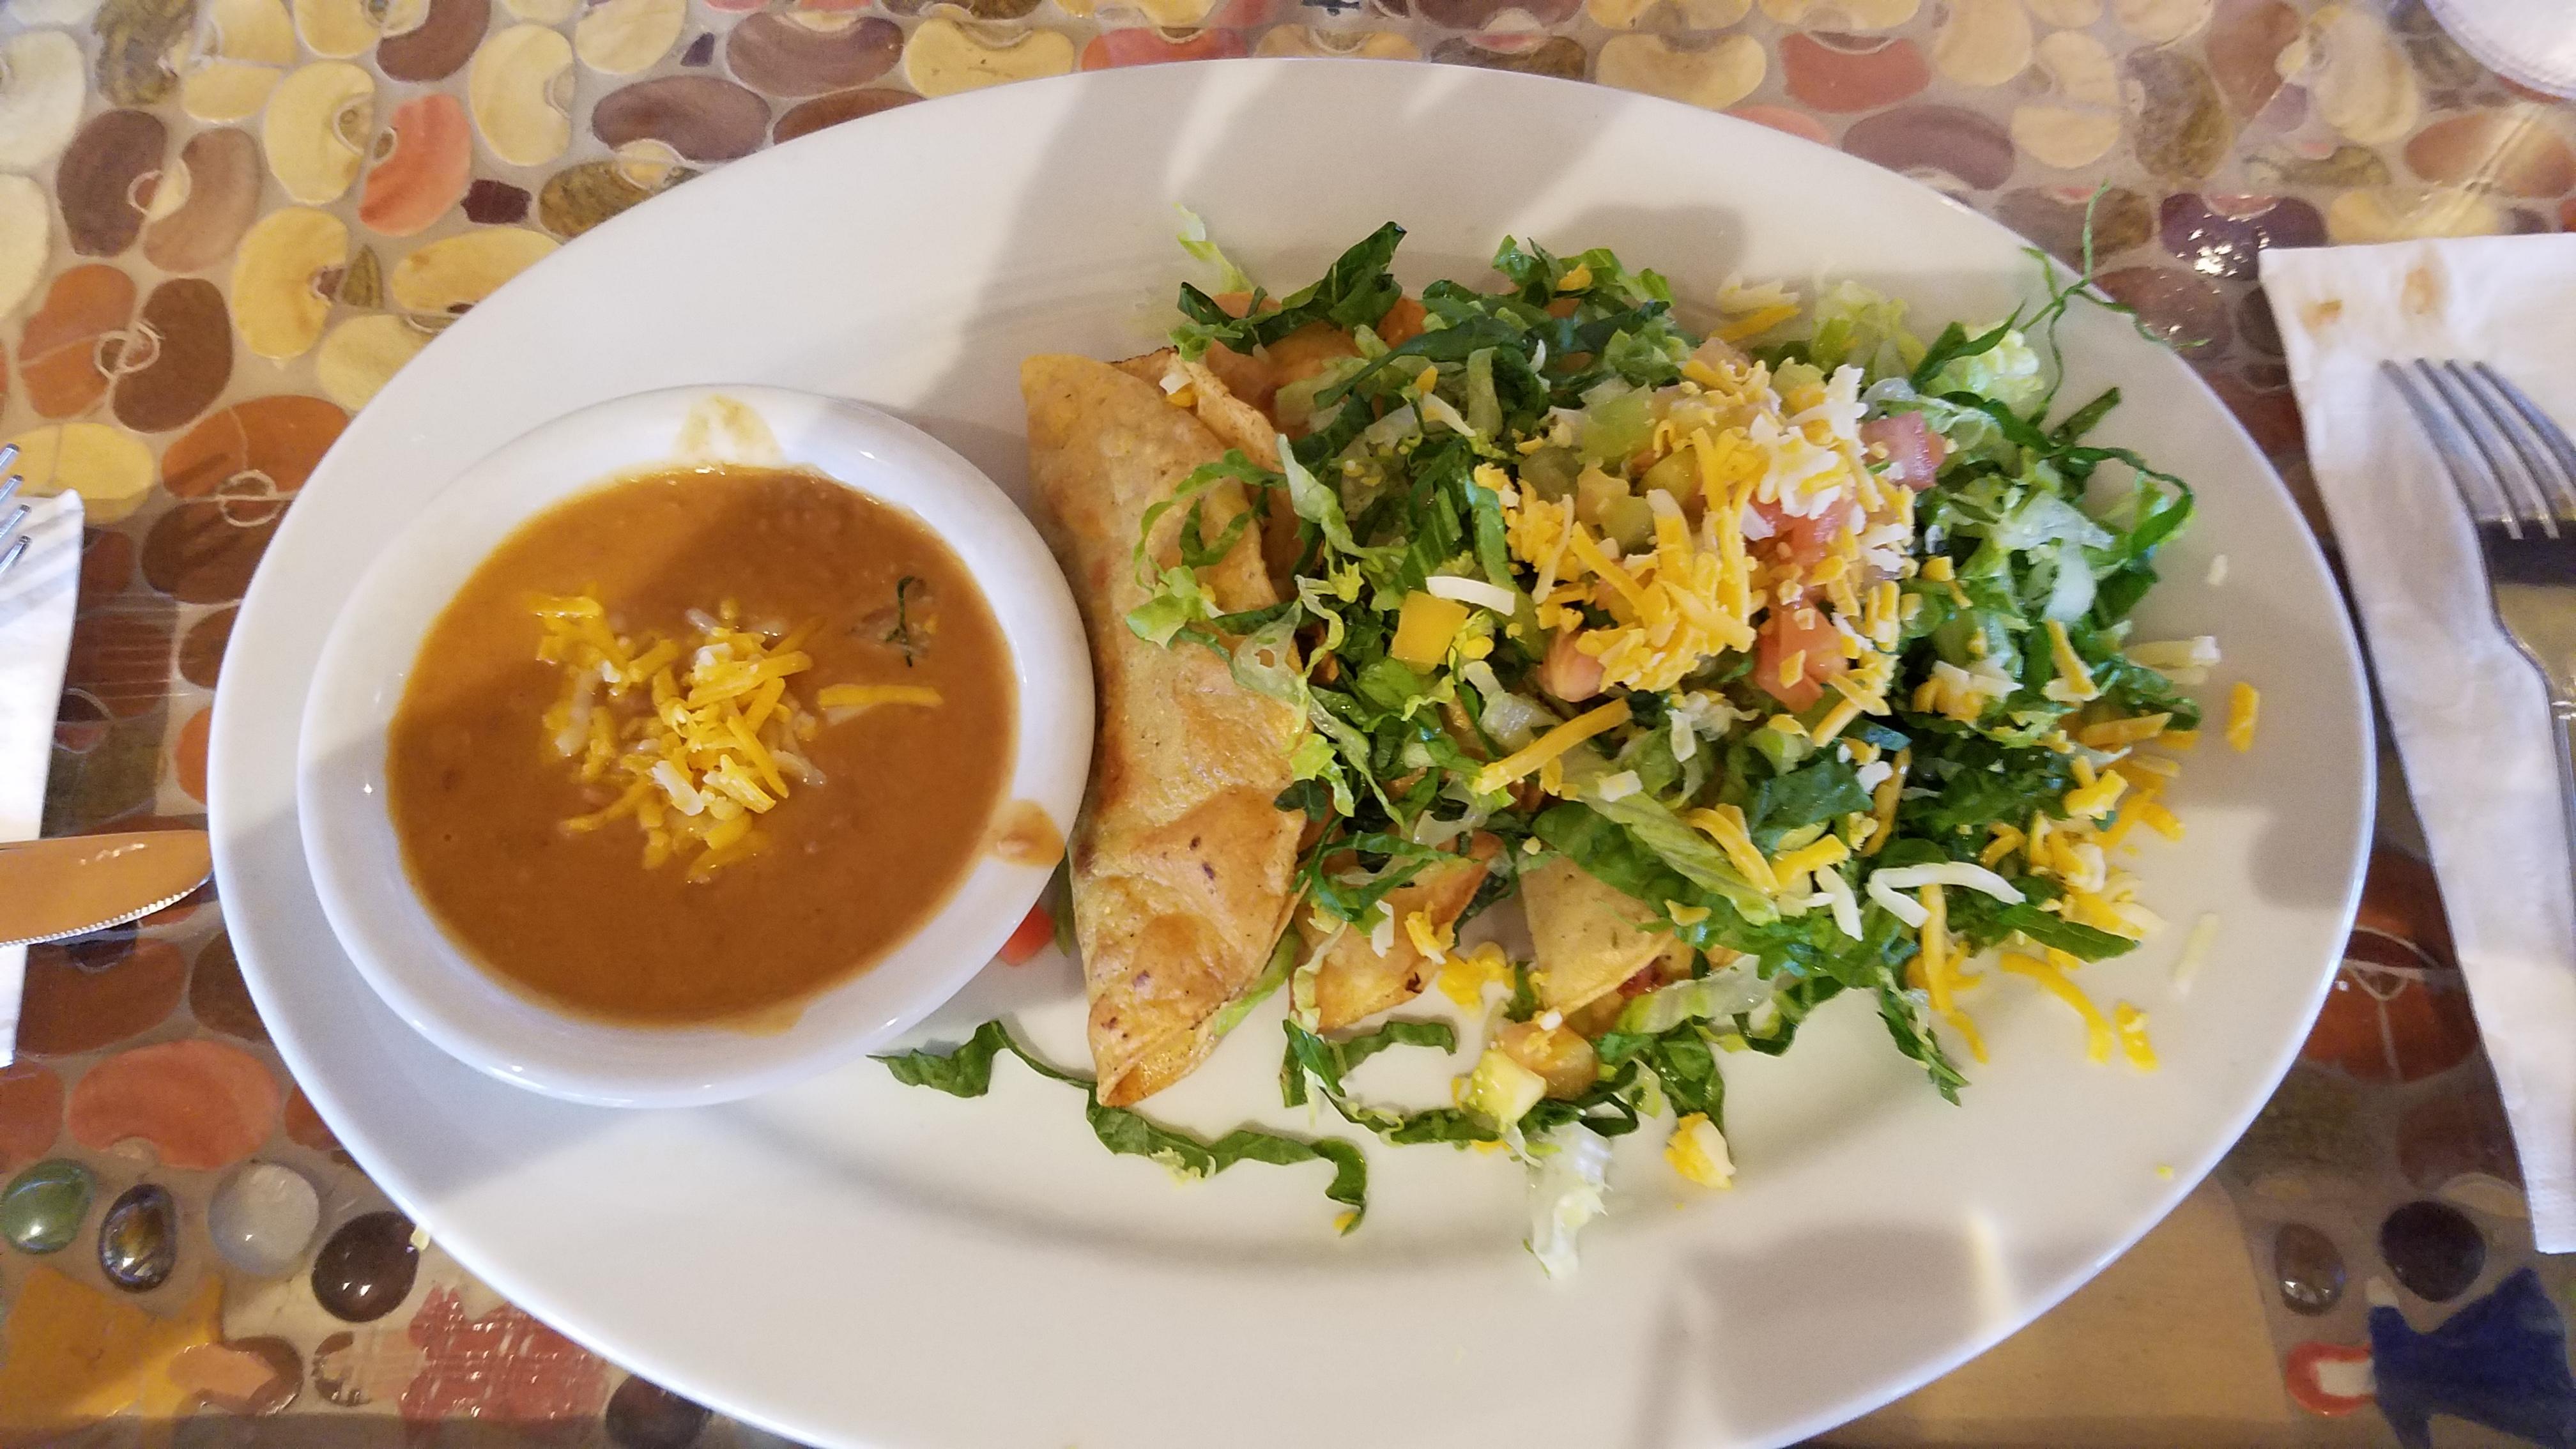 Theresa's Mosaic Cafe, Tucson, AZ :: Angus Muchahos beef tacos.